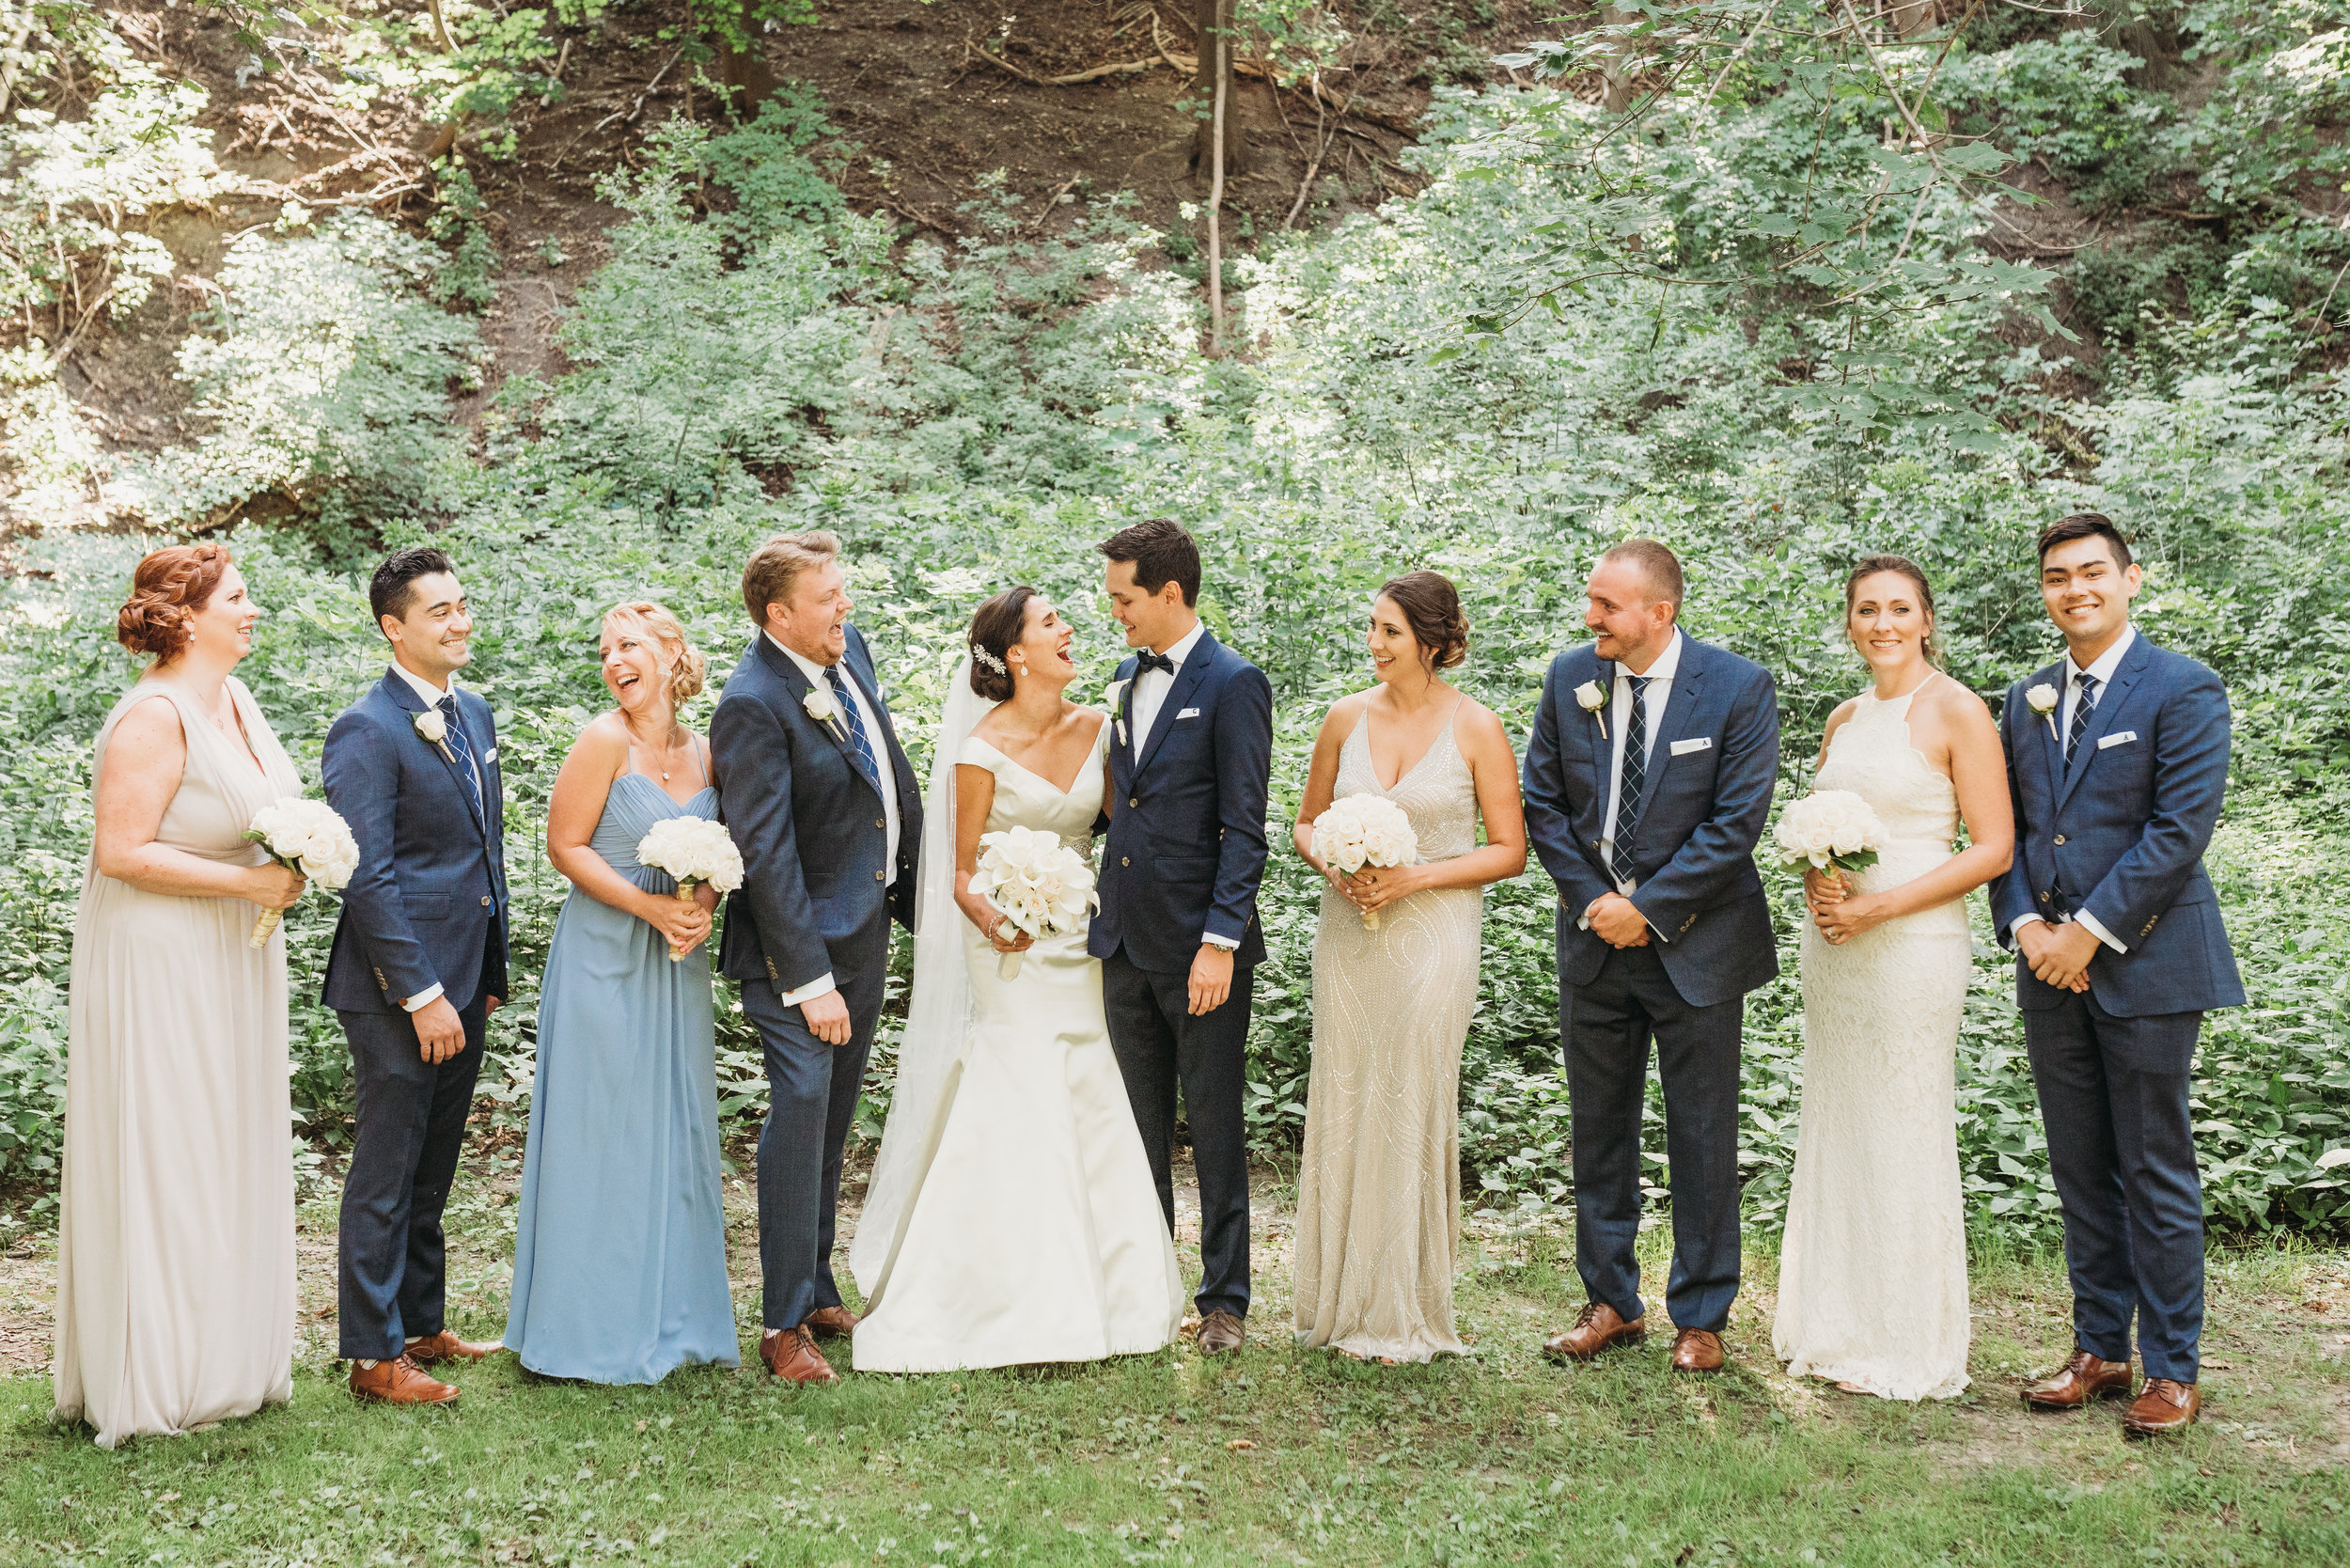 wedding-party-pictures-summer-alexander-muir-memorial-garden-eglington-grand-wedding-by-willow-birch-photo-toronto-documentary-wedding-photographers.jpg